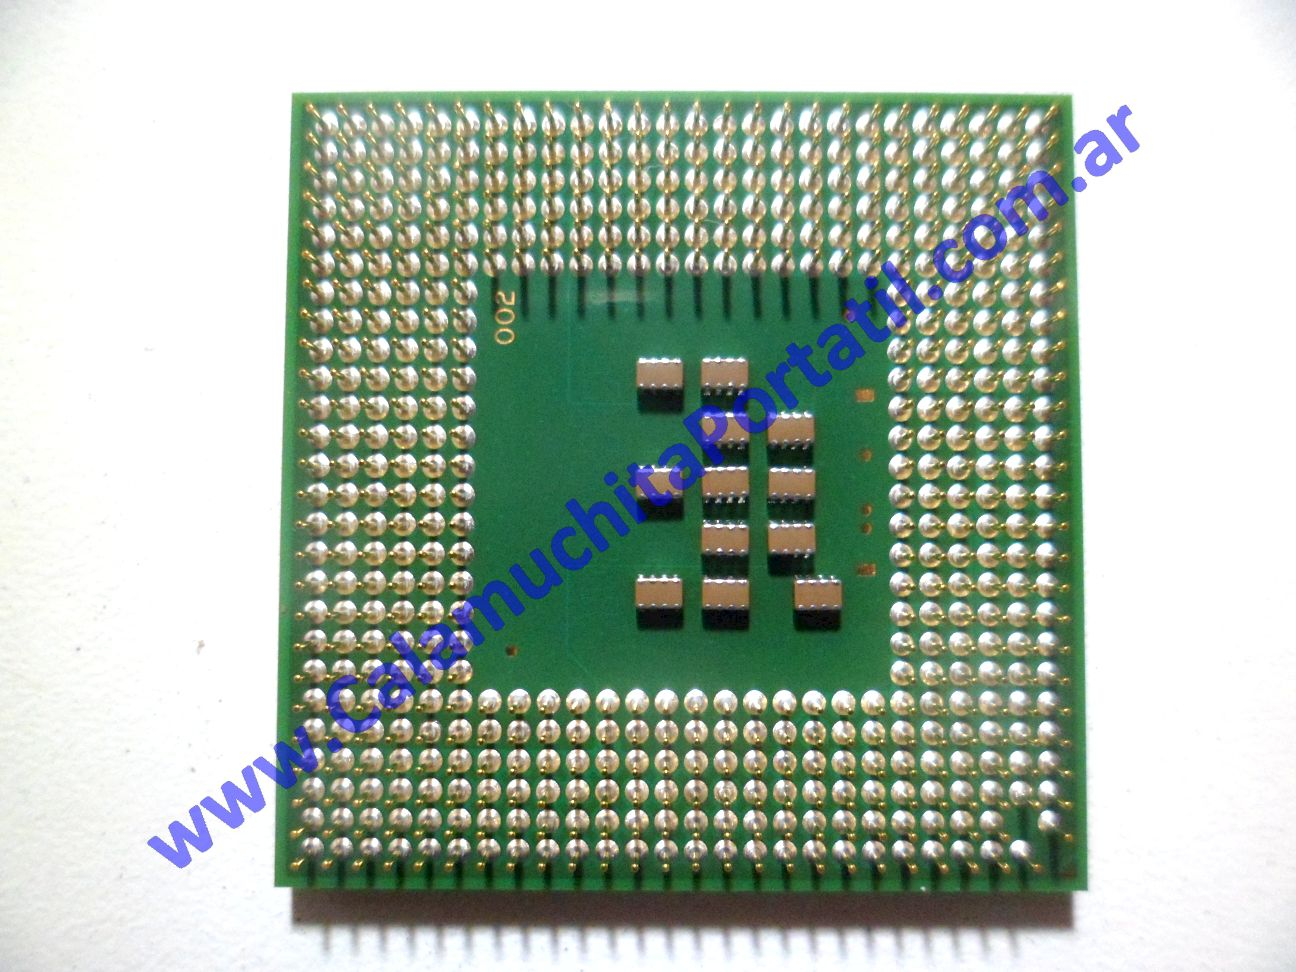 0047QQA Procesador Dell Inspiron 2200